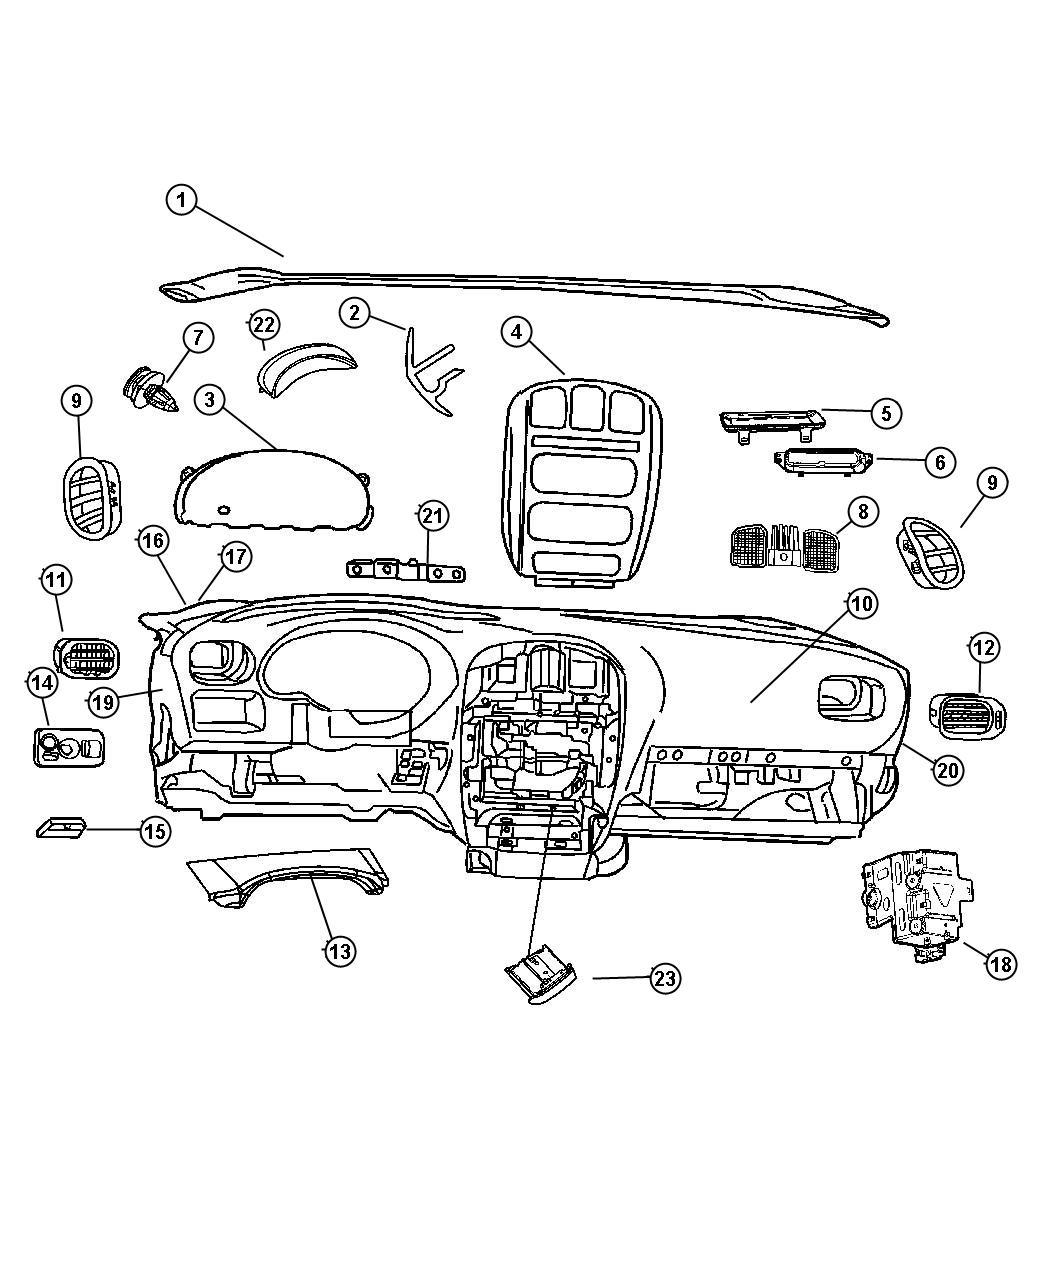 2010 Dodge Ram 1500 Module. Message center. [j3]. Trim